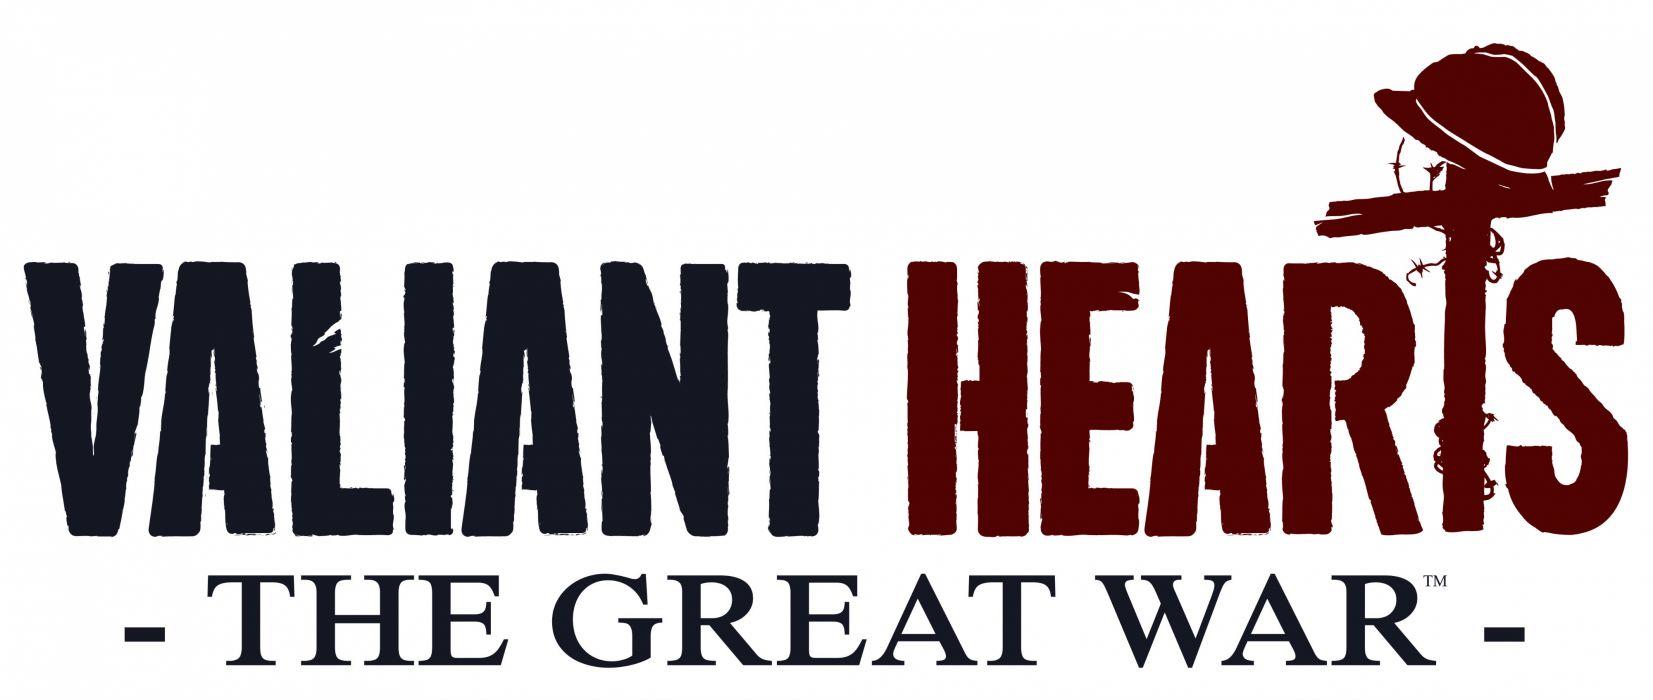 Valiant Hearts The Great War   t2 wallpaper